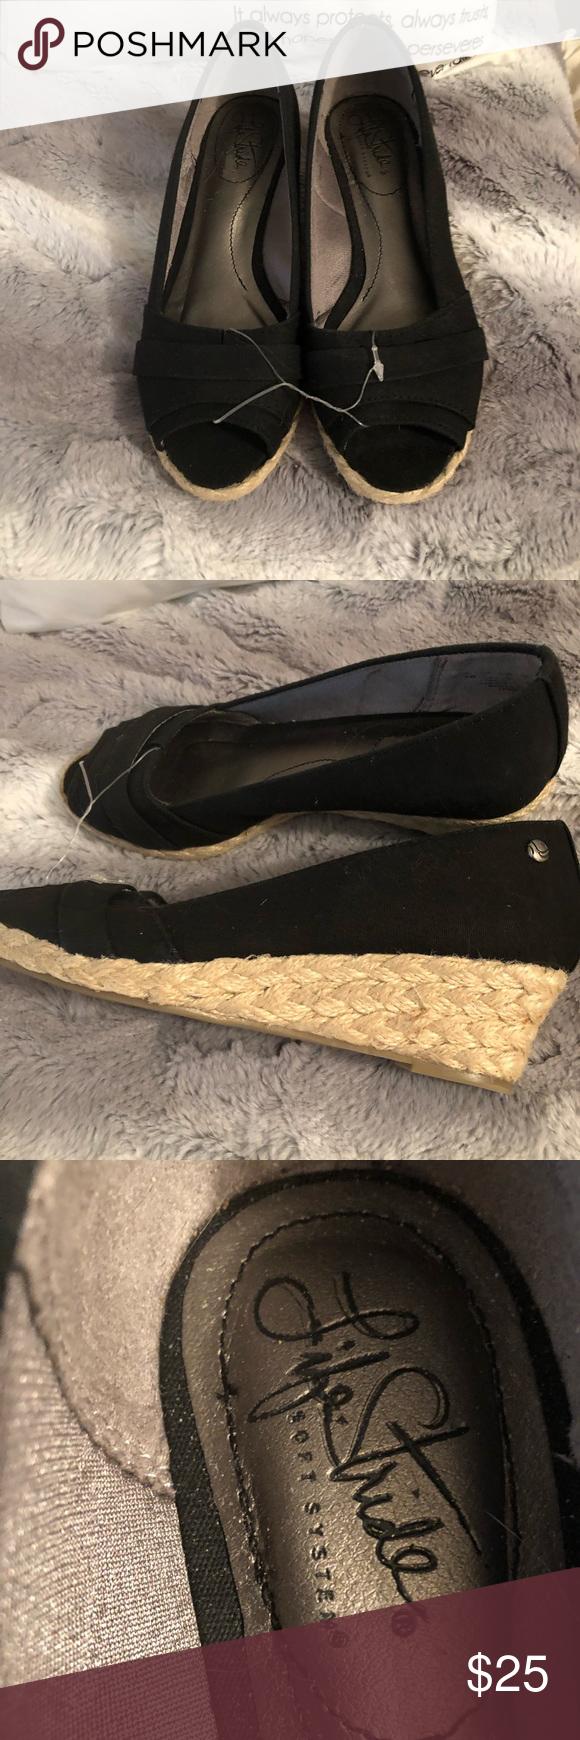 New Boutique 🌹Black Espadrilles New Boutique 🌹Size: 6W🌹Color: Black🌹Fabric upper🌹Brand: Life Stride🌹1.5 inches Height Life Stride Shoes Espadrilles